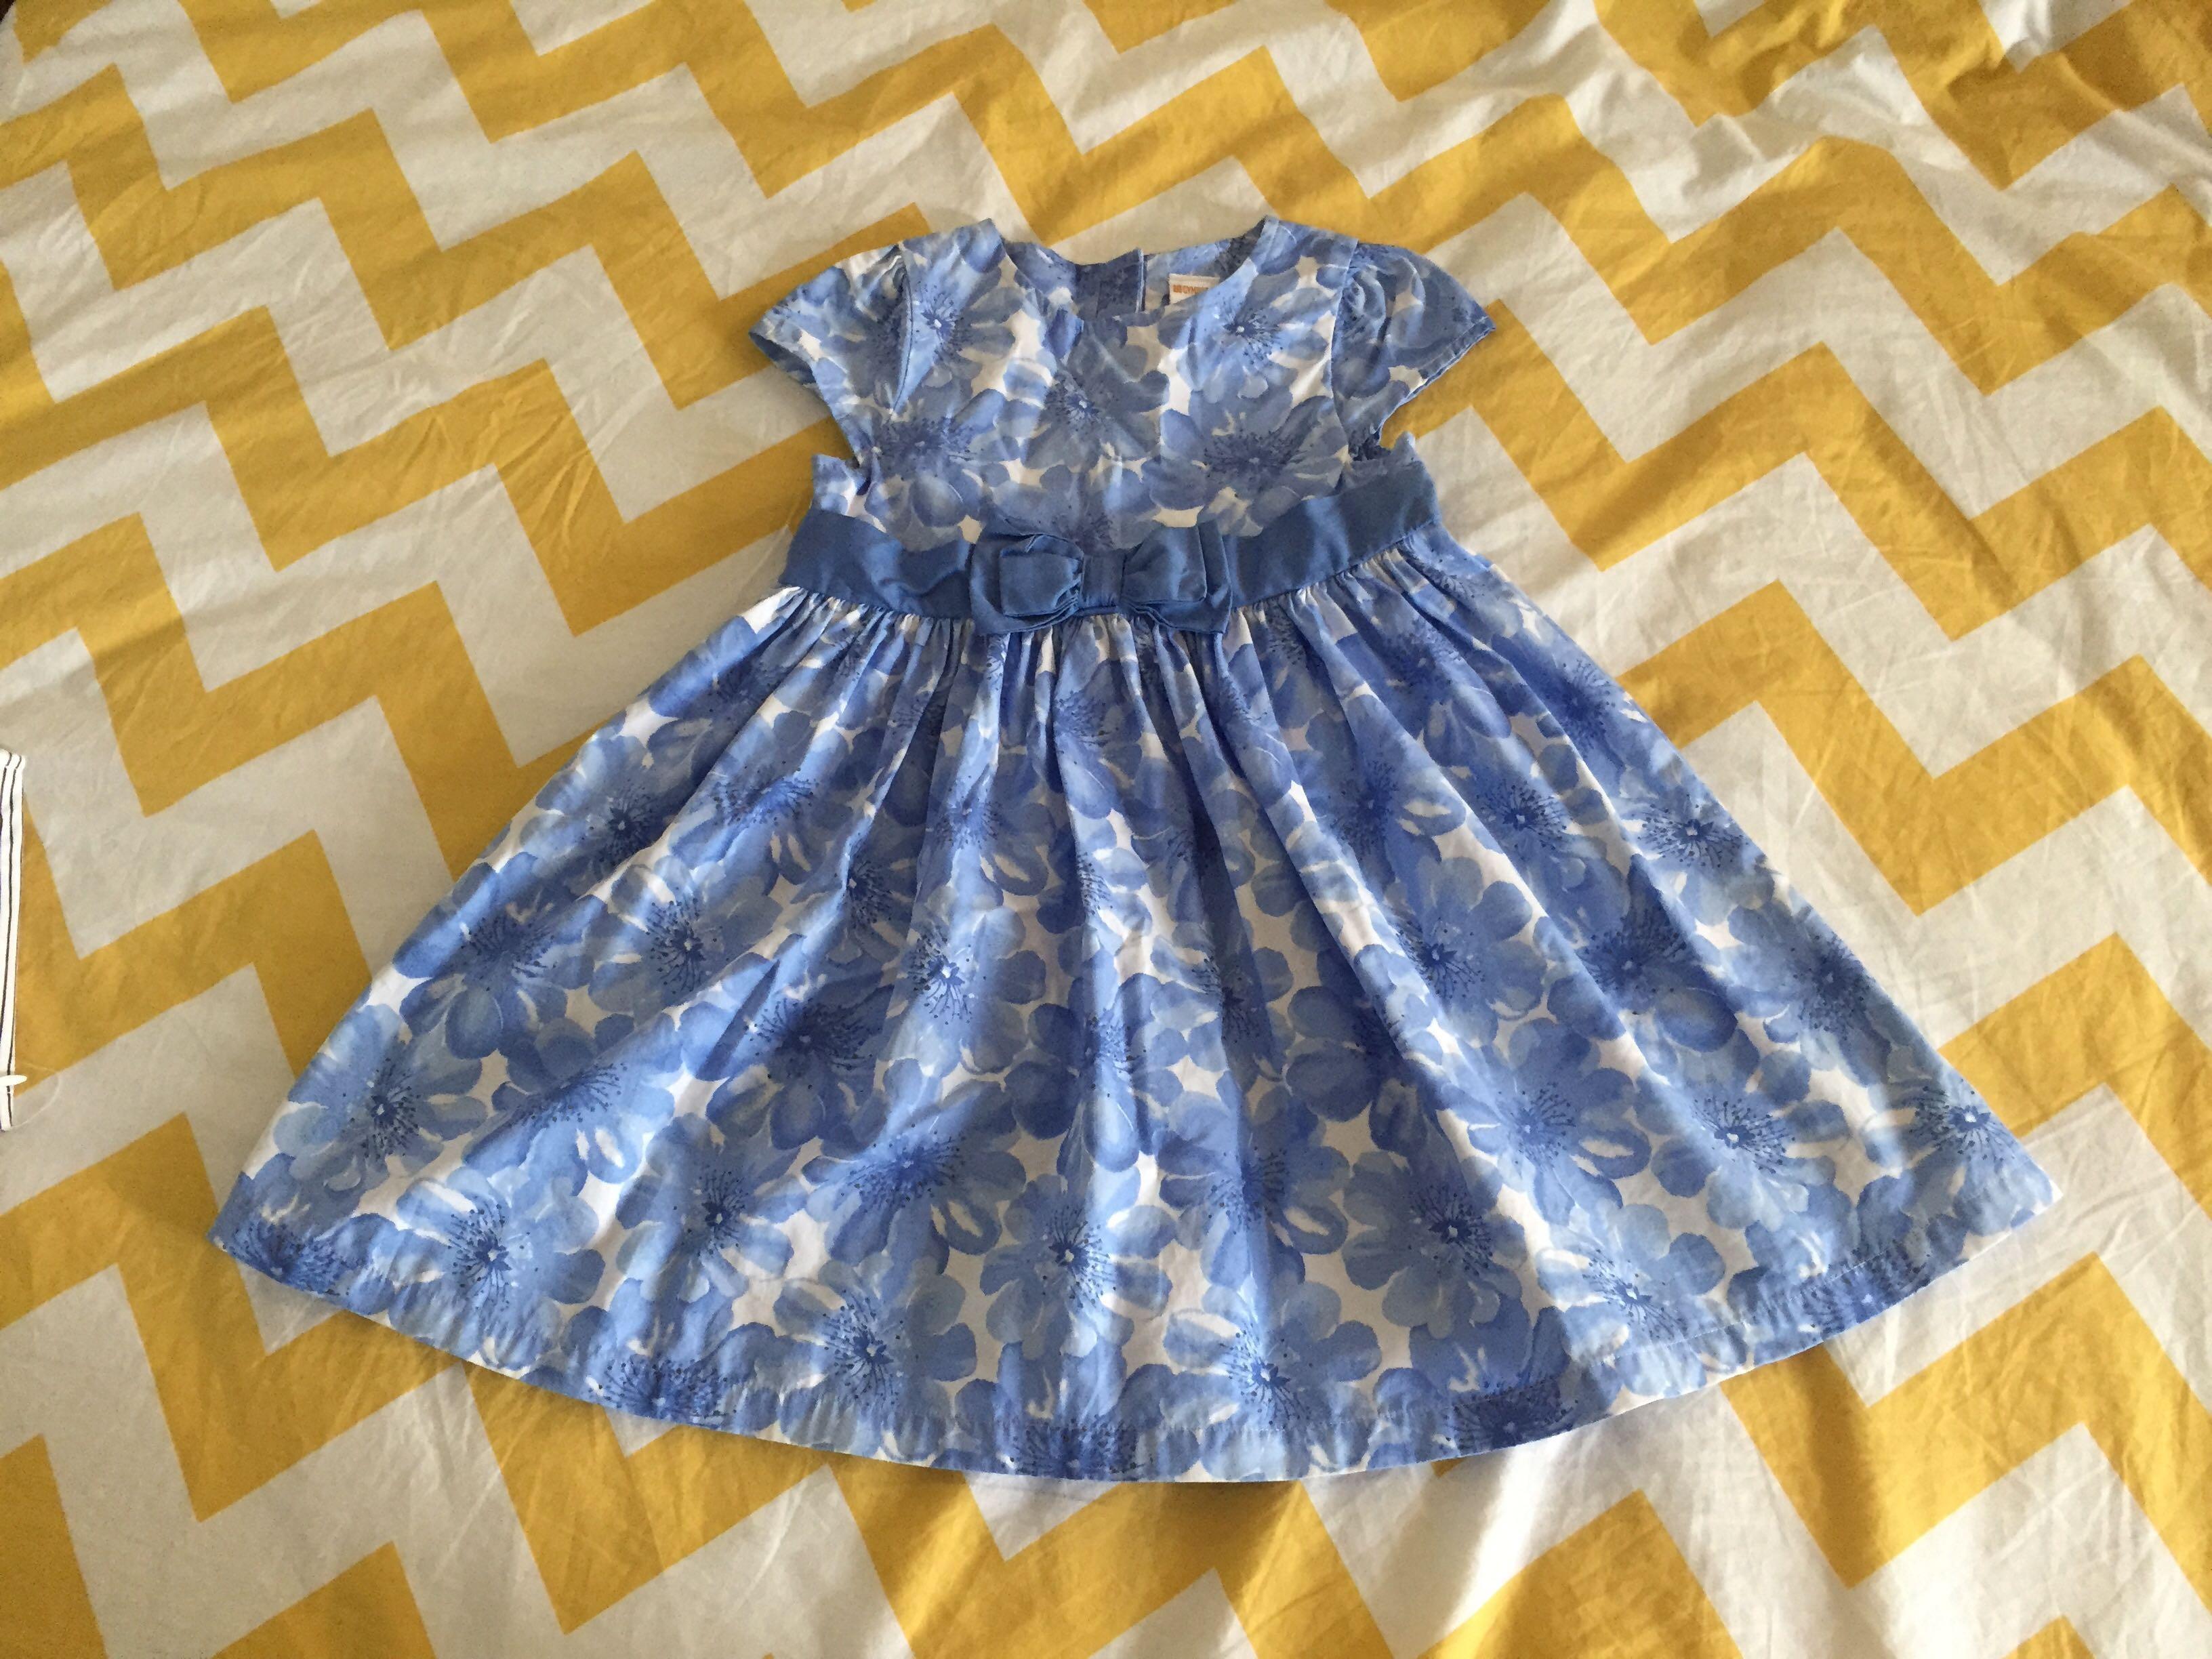 64497eeee46f1 Gymboree dress 4-5t, Babies & Kids, Girls' Apparel, 4 to 7 Years on ...